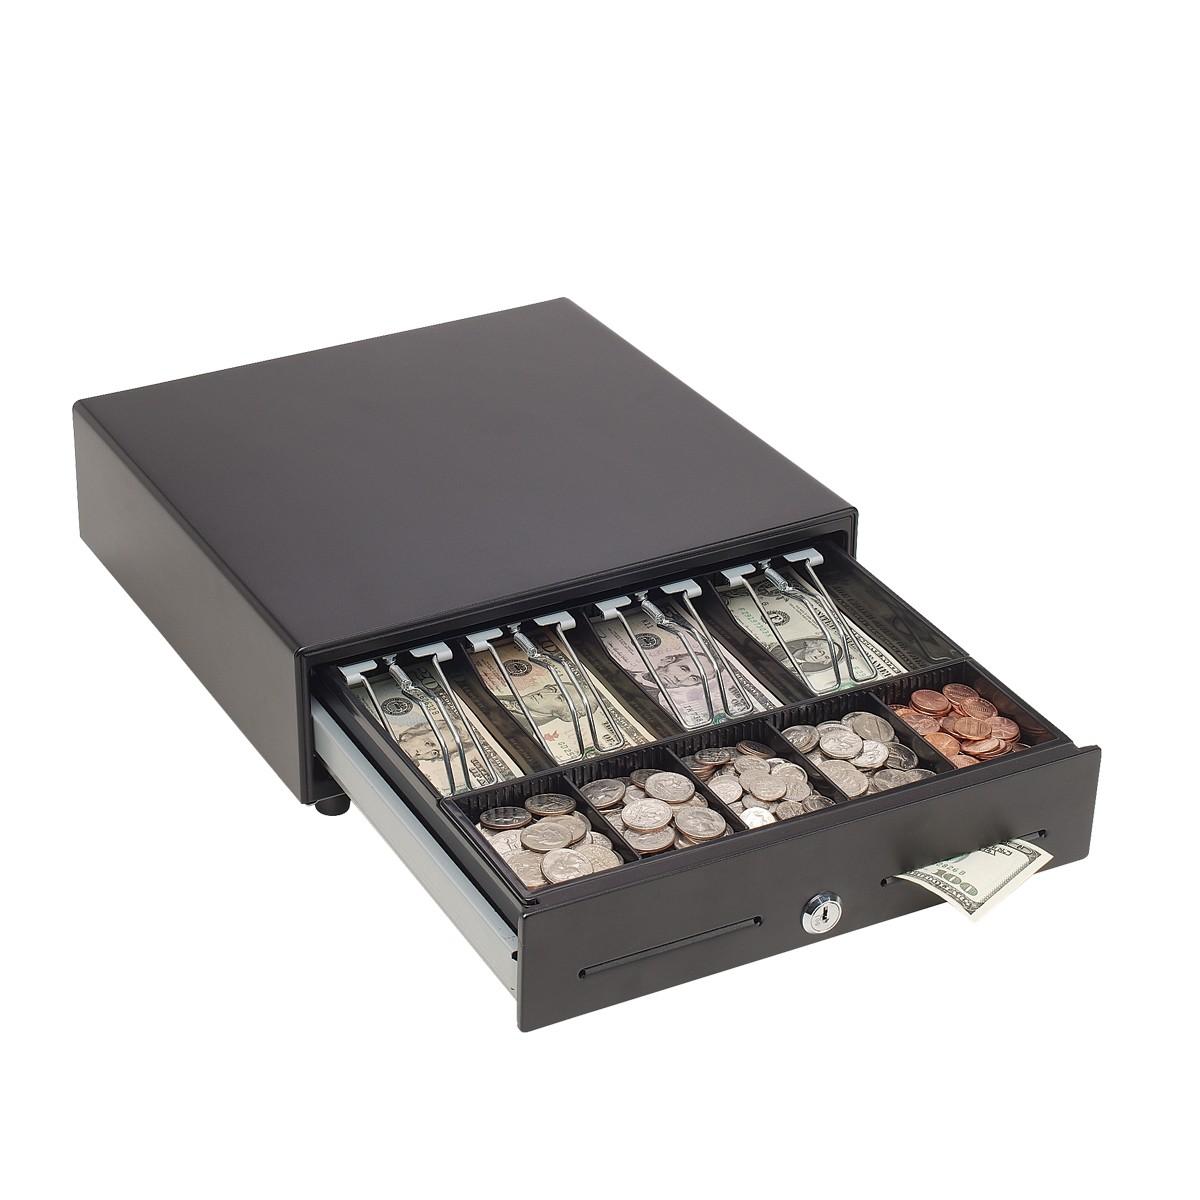 SteelMaster® 1046T Touch Release Cash Drawer